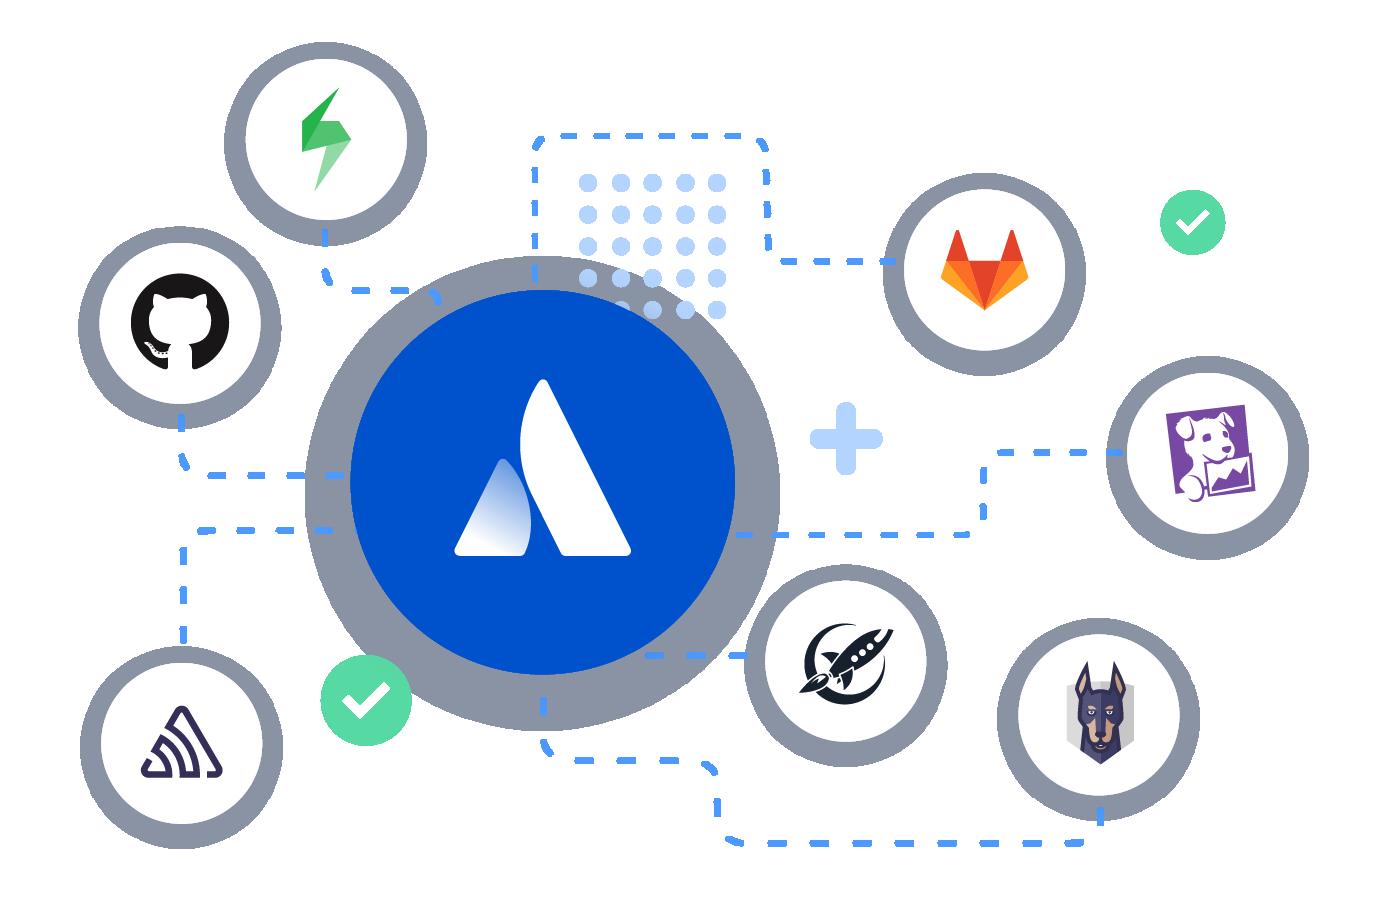 Integrazioni DevOps di Atlassian